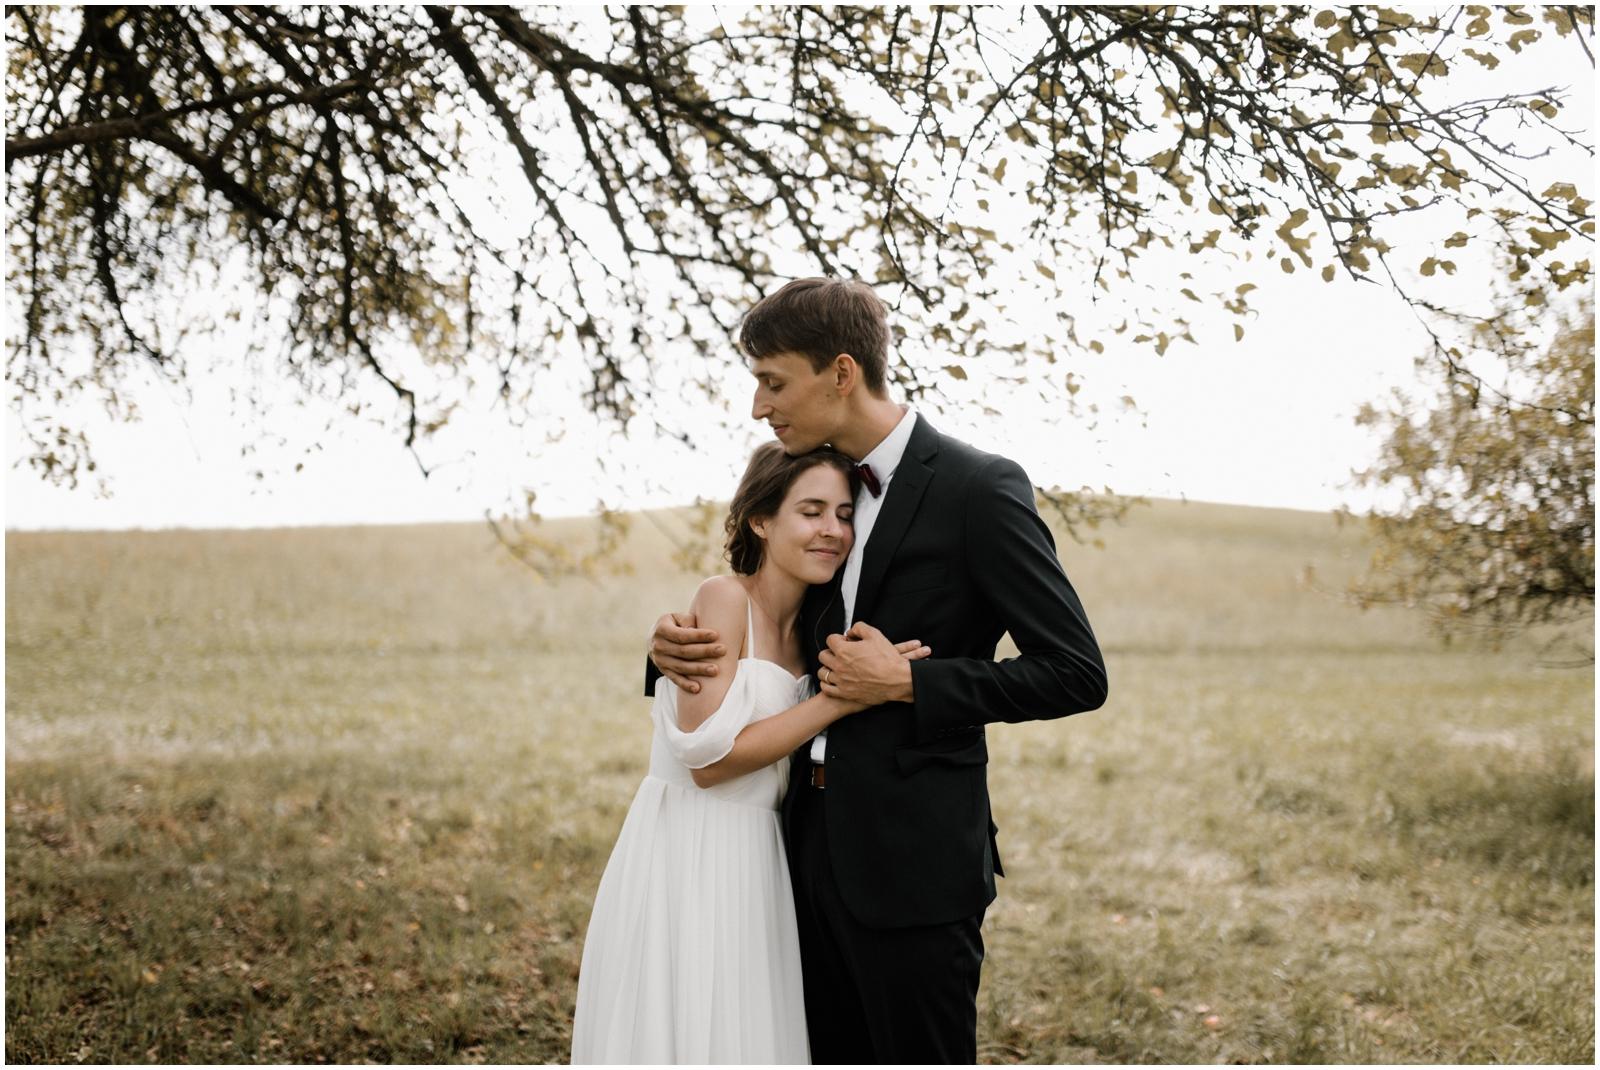 mirjam_thomas_wedding-165.jpg